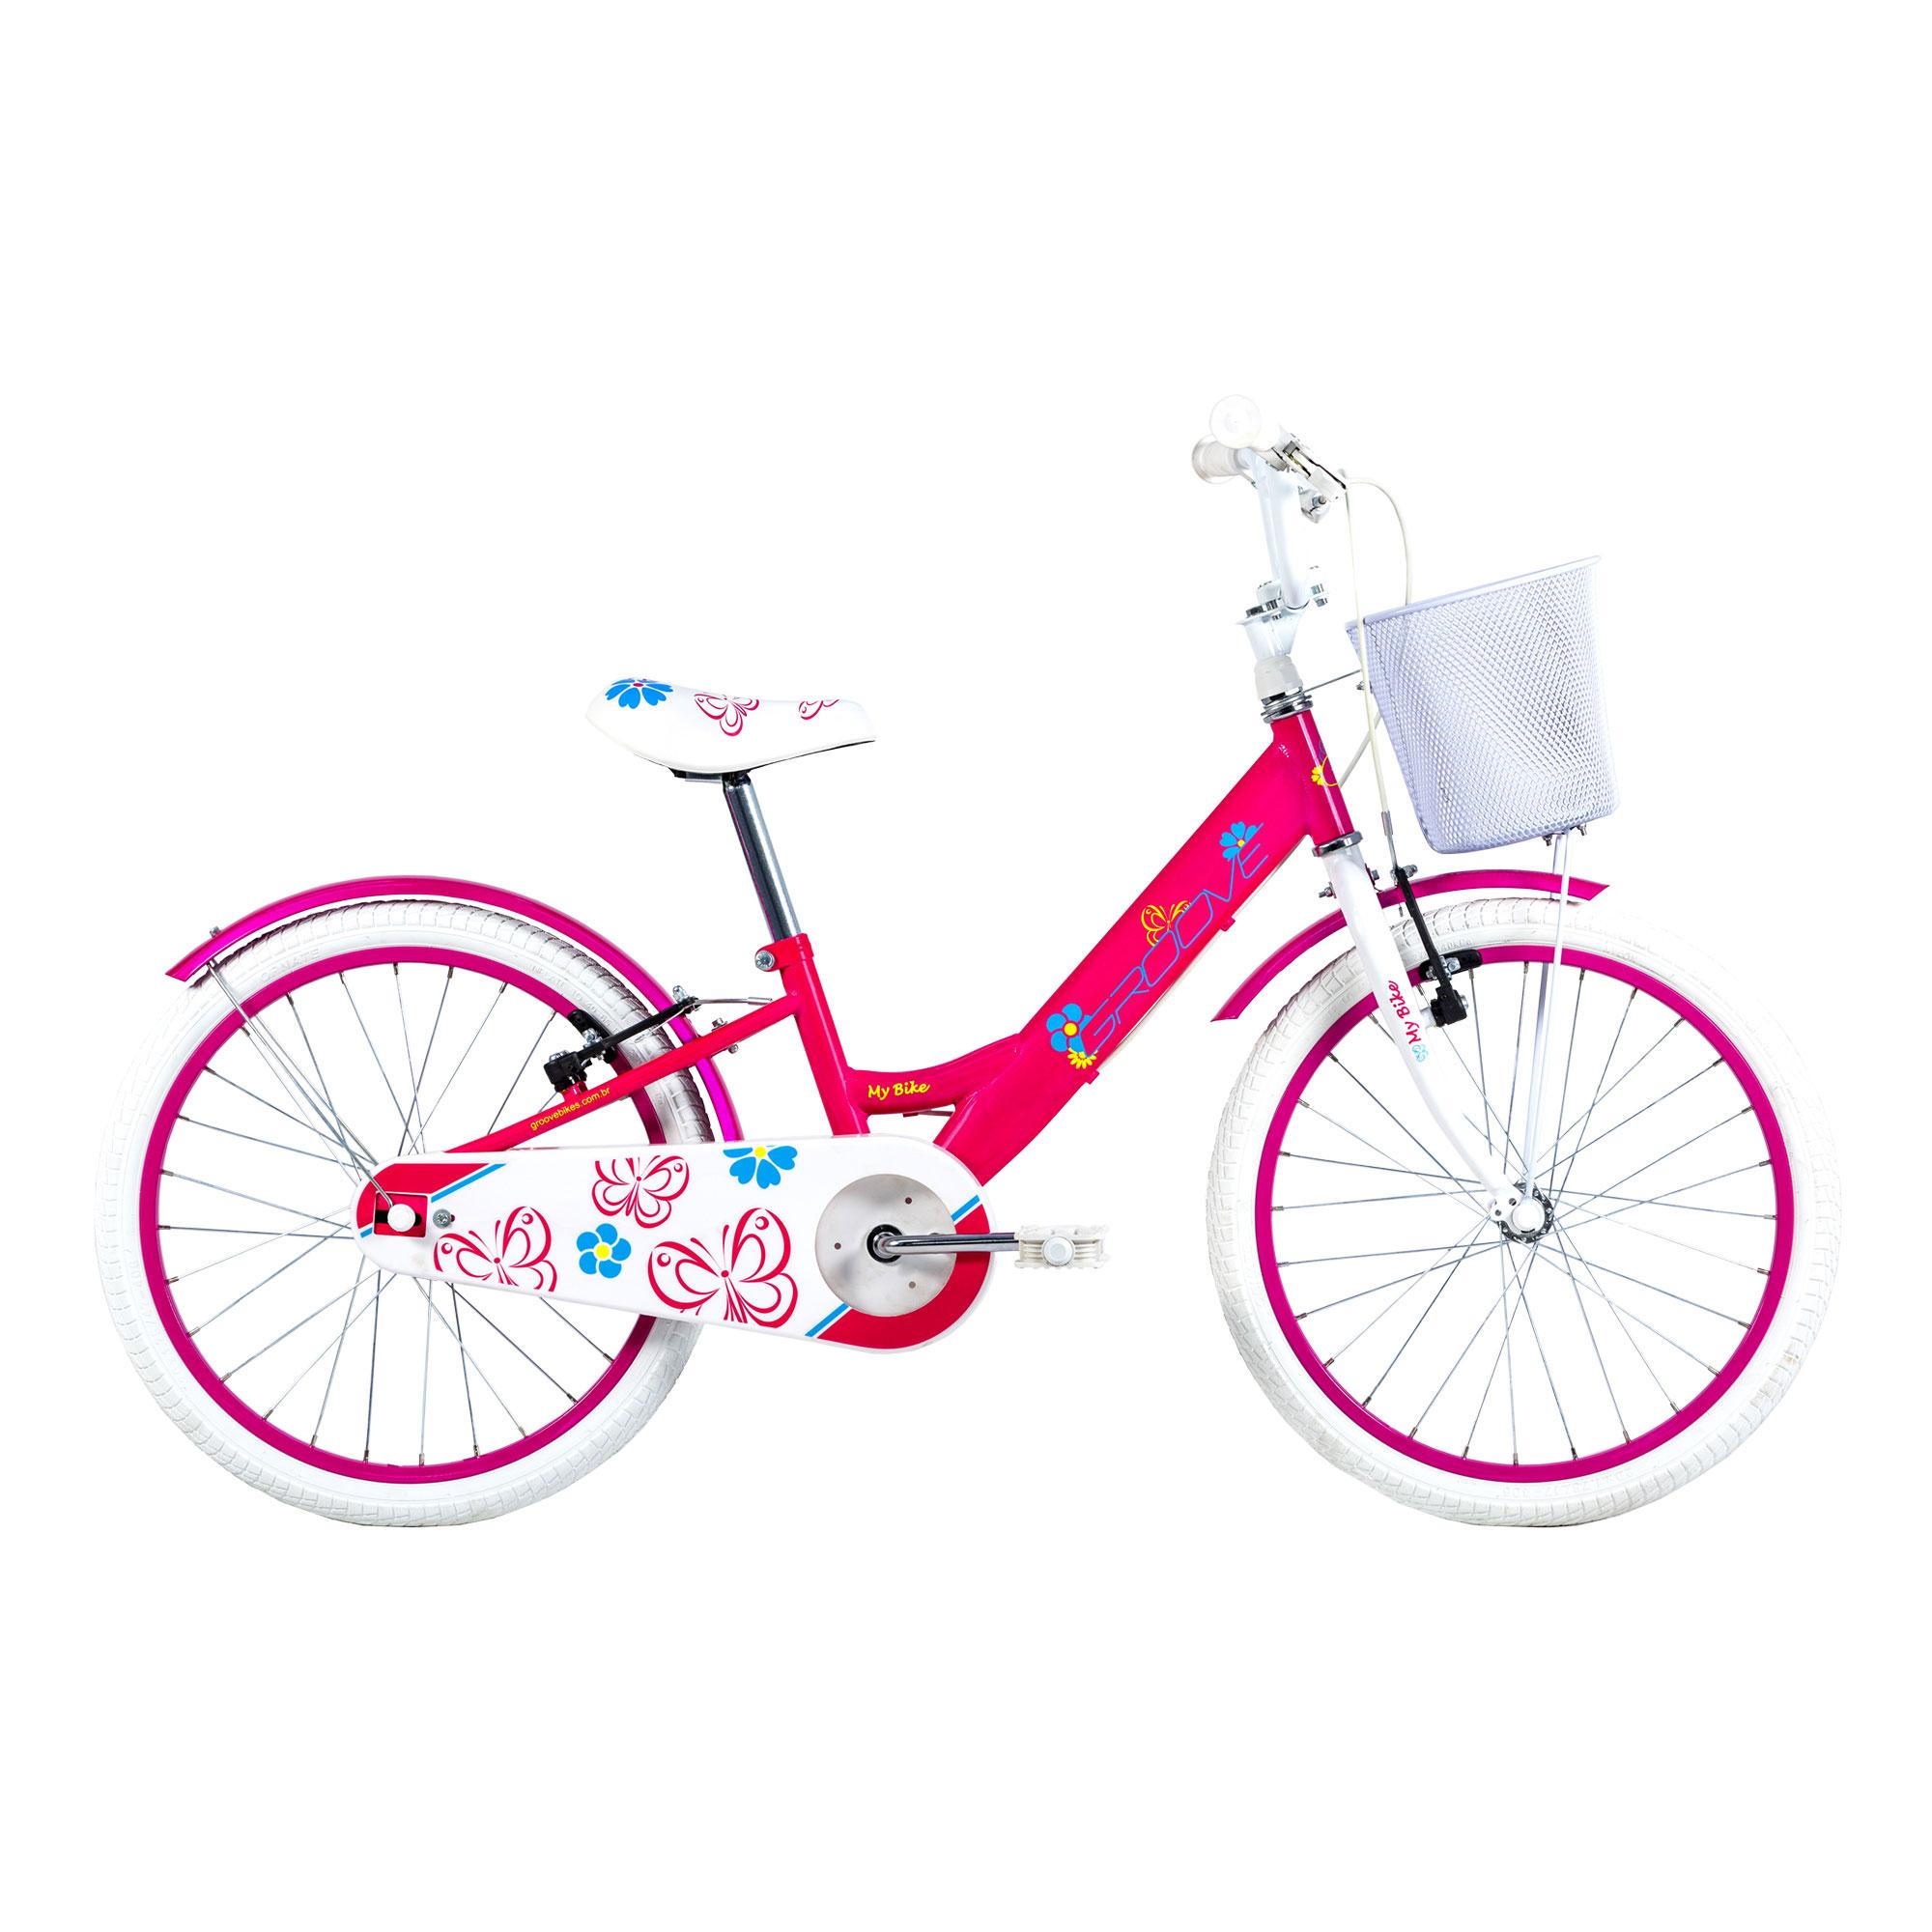 Bicicleta Groove Infantil Aro 20 My Bike Feminina